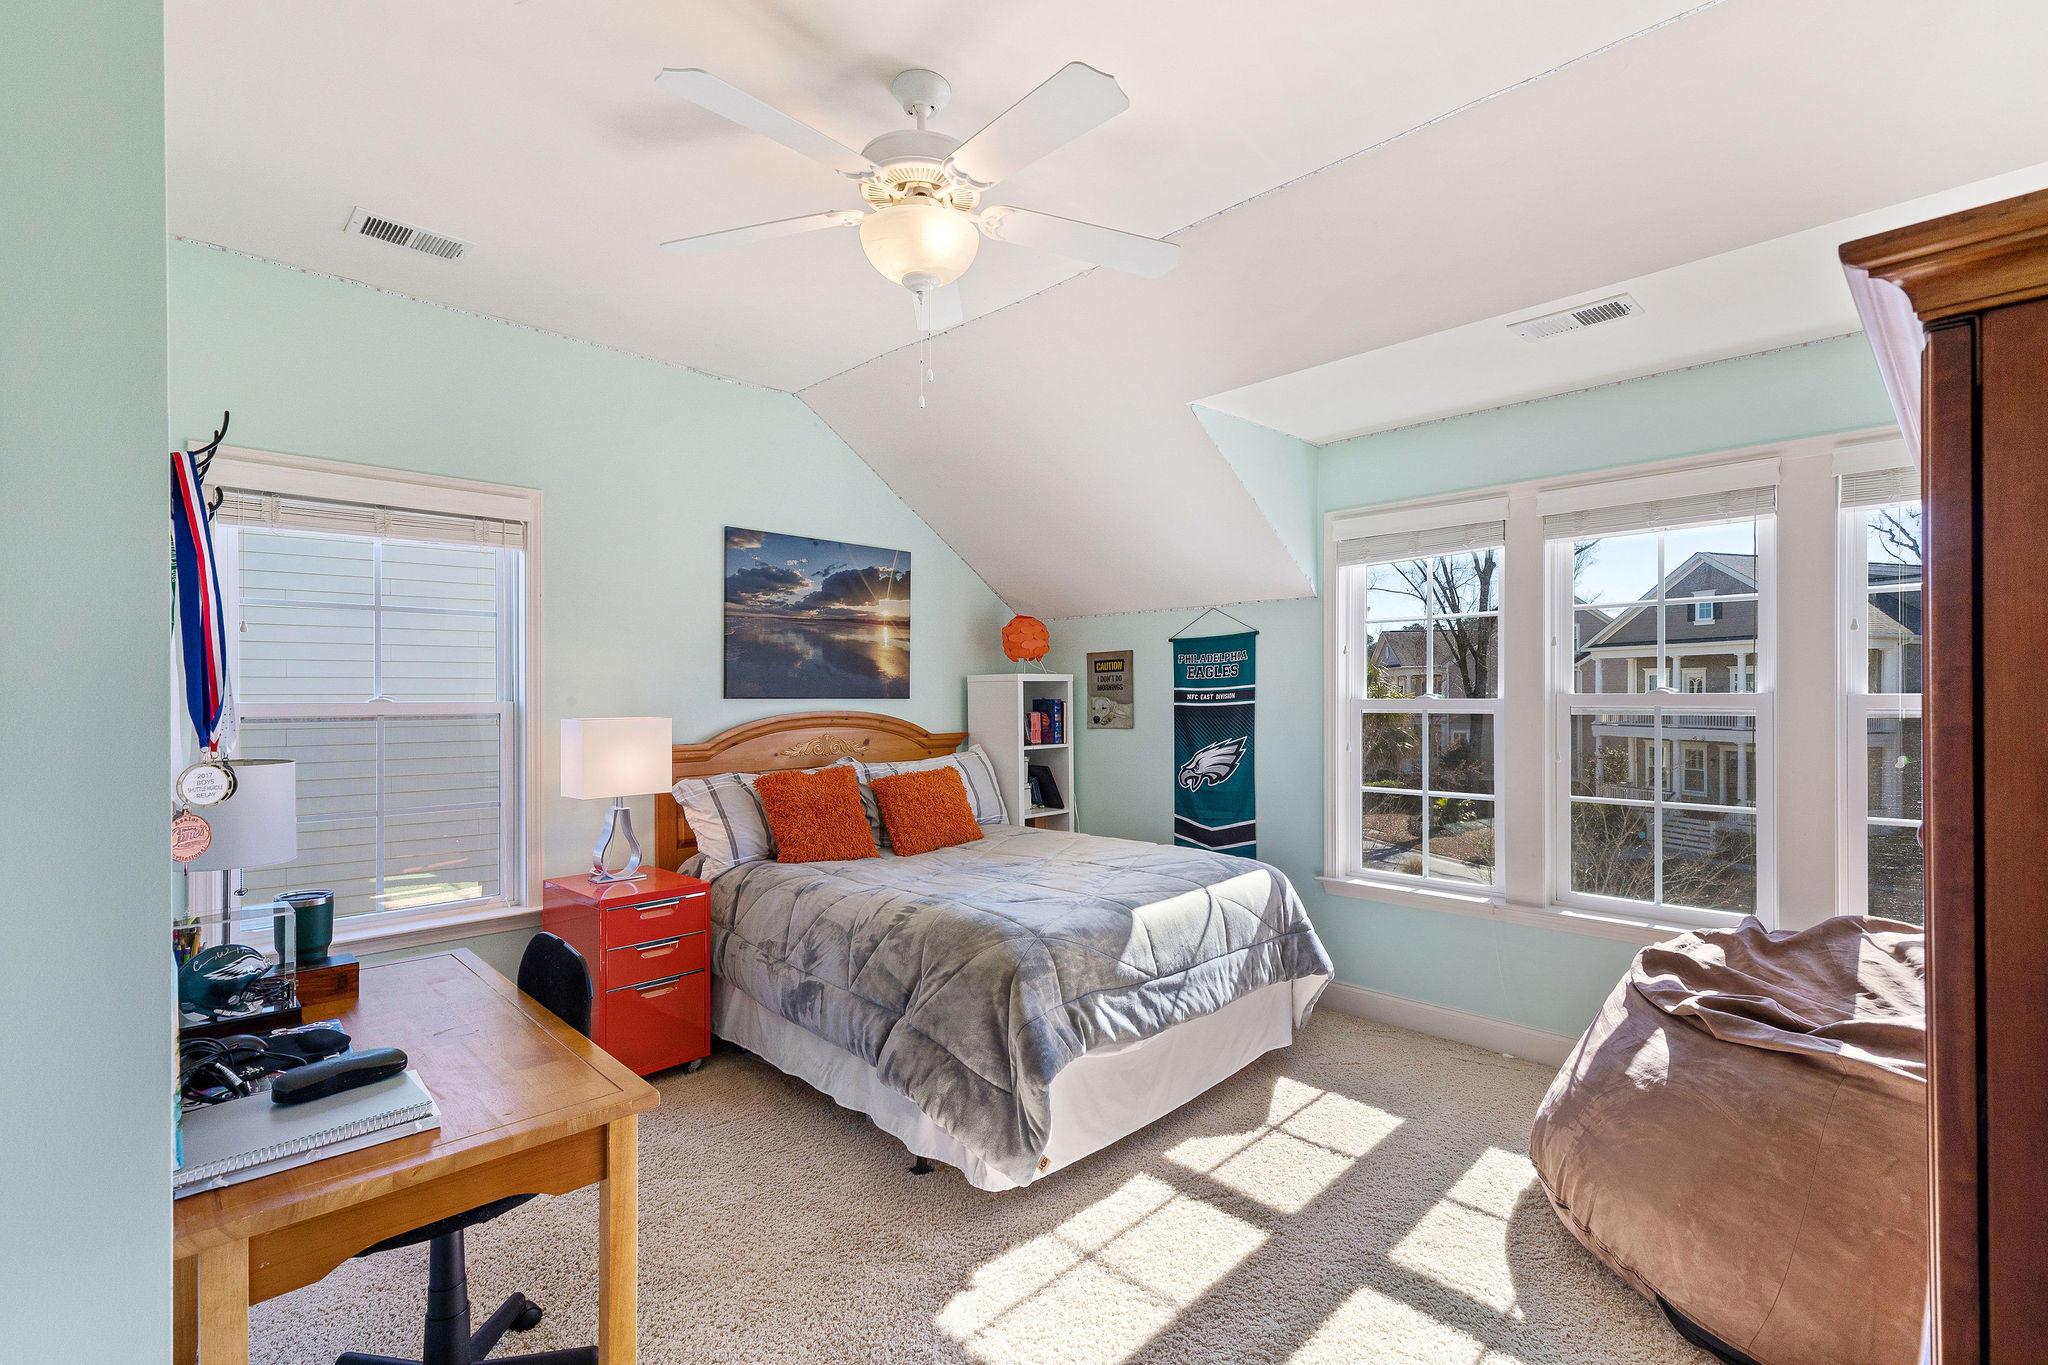 Dunes West Homes For Sale - 3212 Hatchway, Mount Pleasant, SC - 59